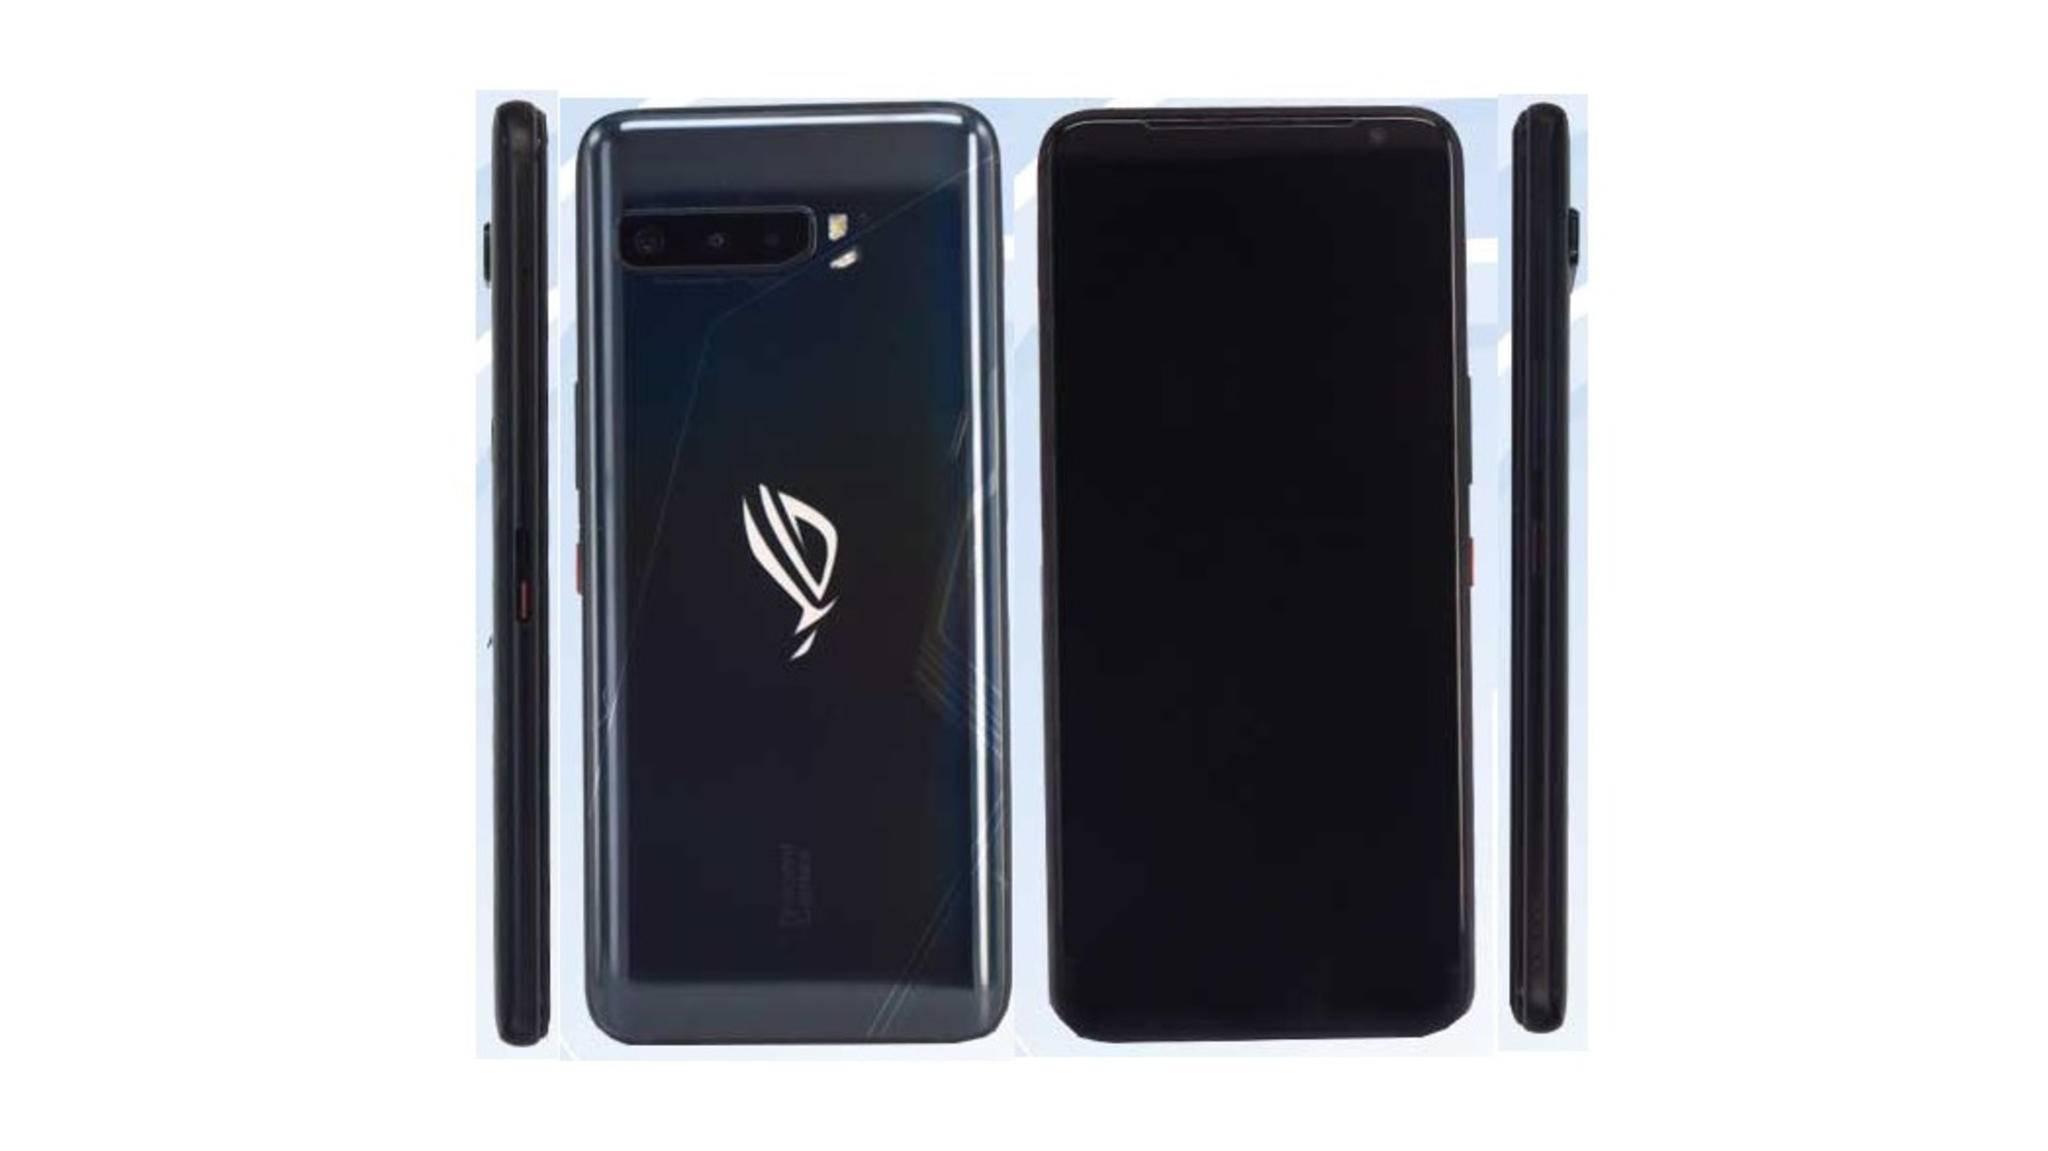 ASUS-ROG-Phone-3-TENAA-render